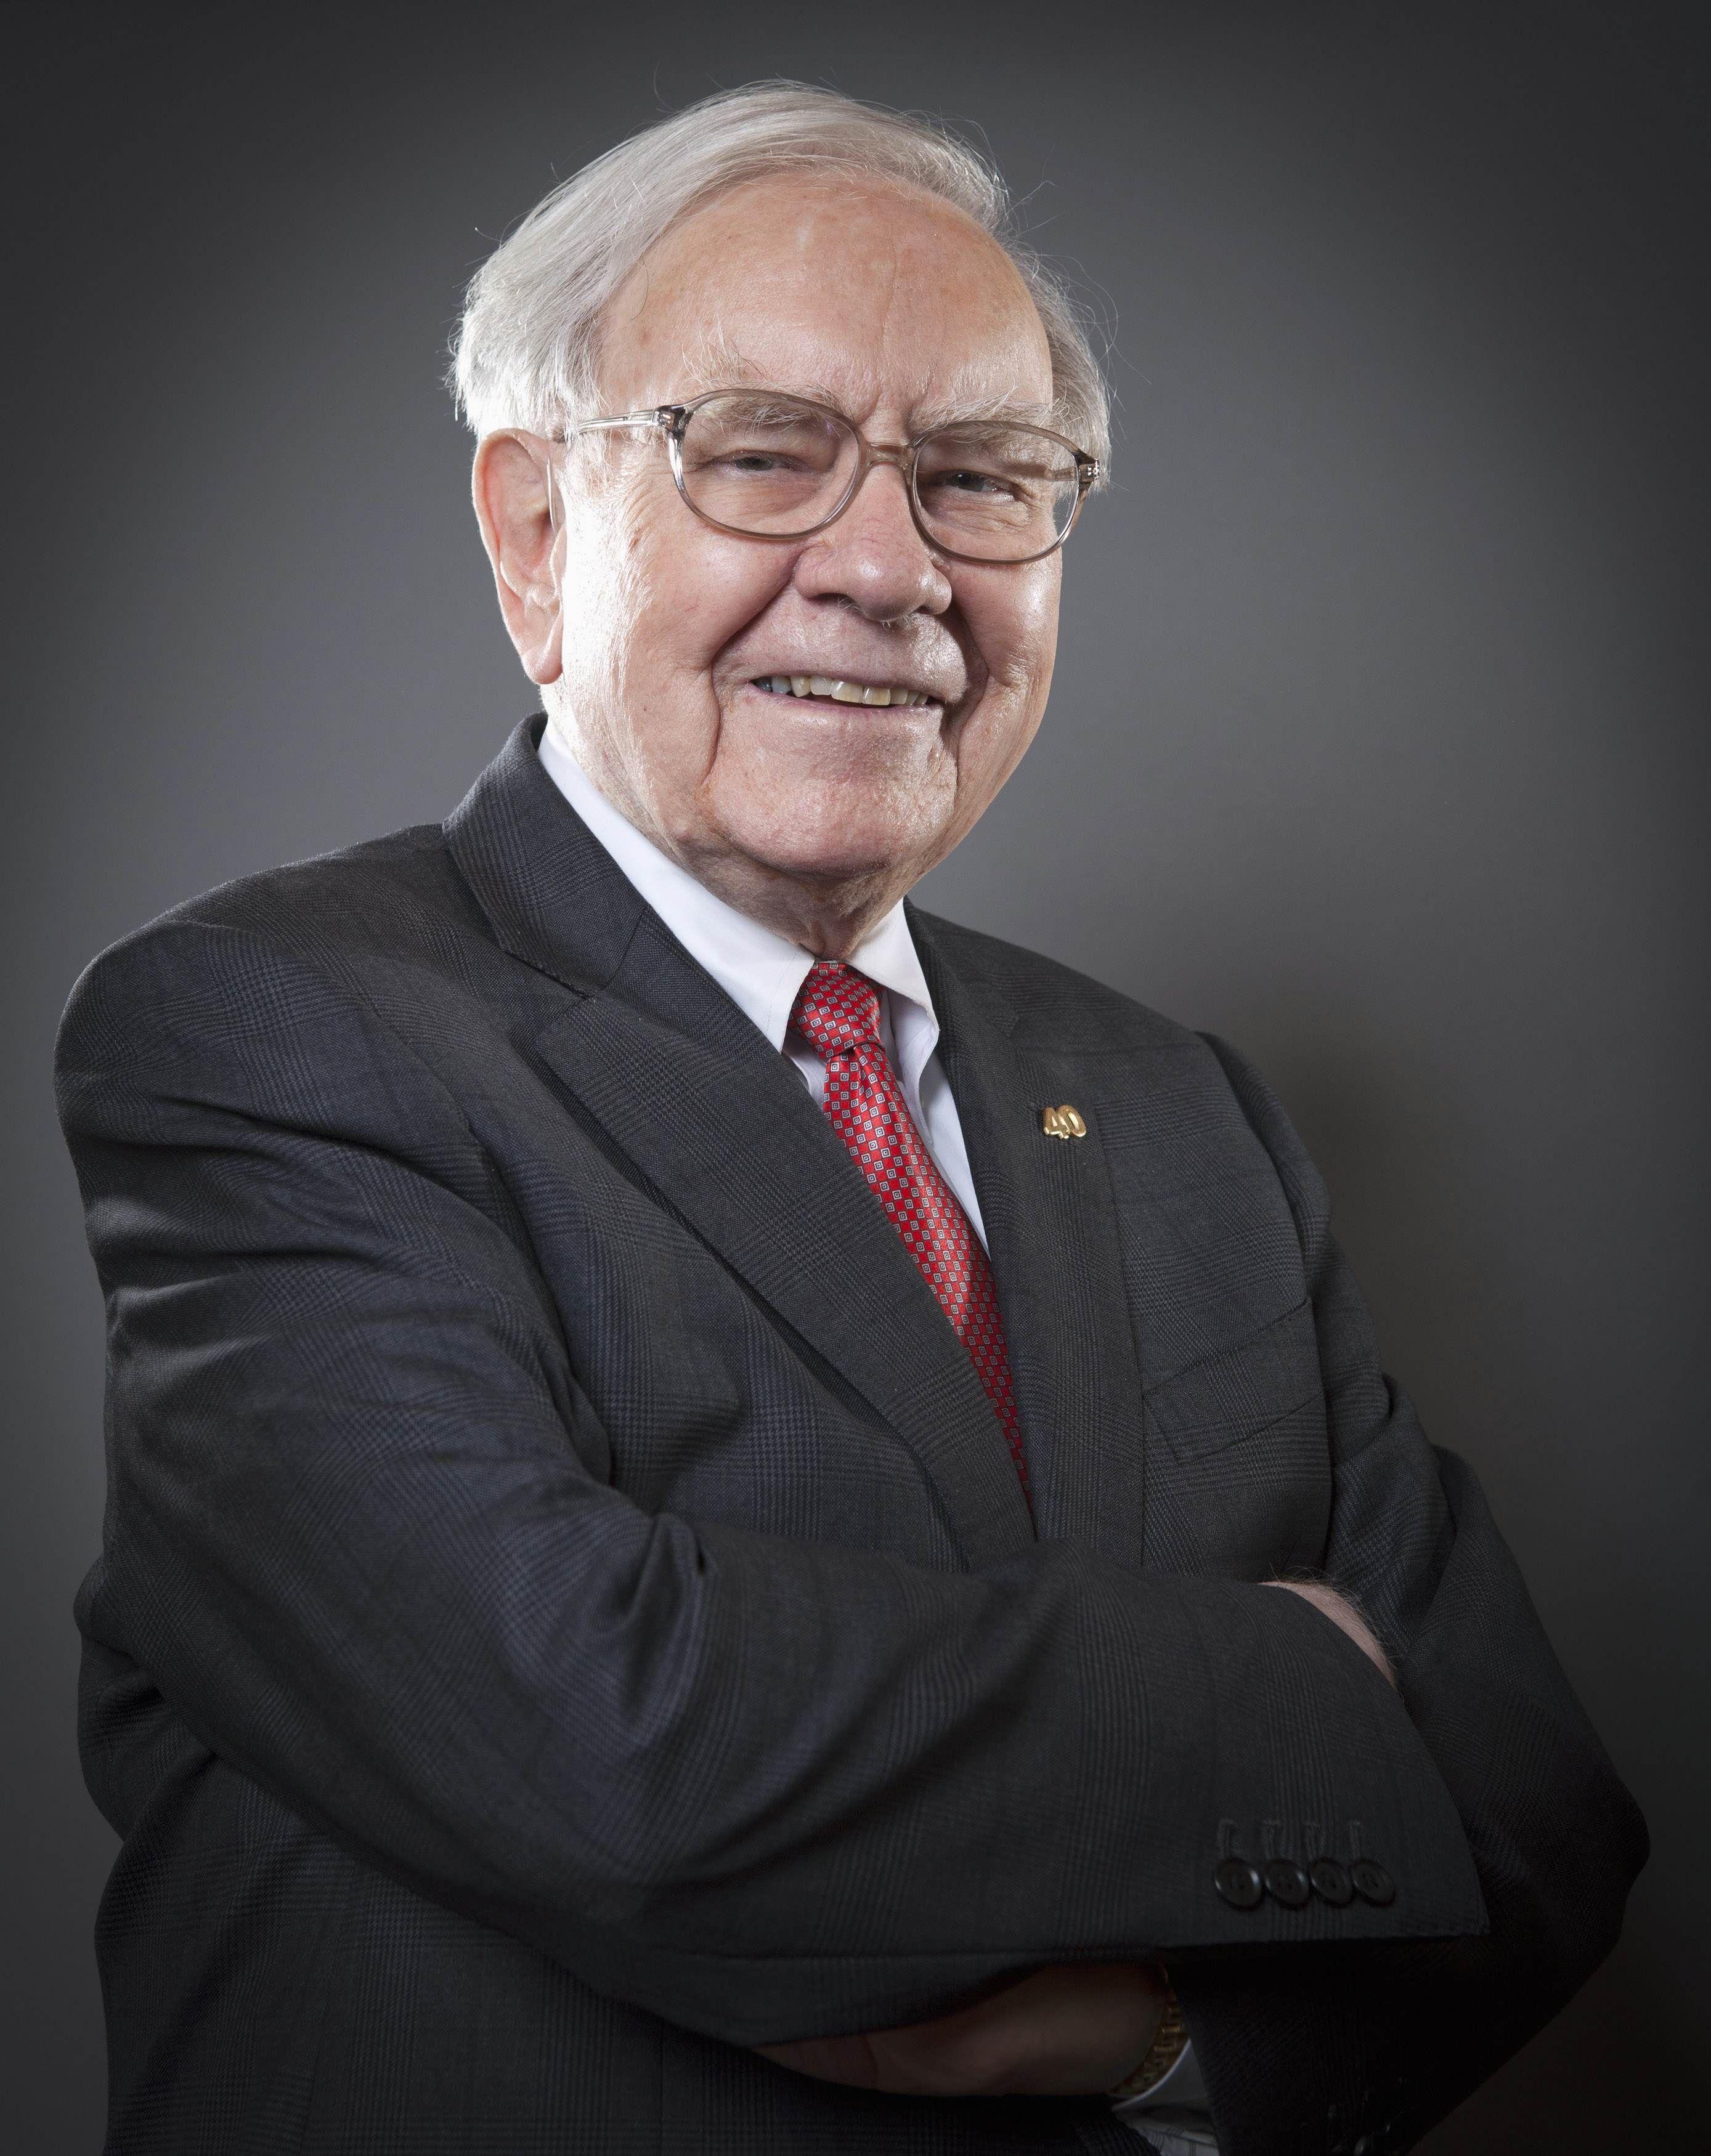 Top 10 Richest Billionaires In The World Topteny Com Warren Buffett Successful People Richest Celebrities